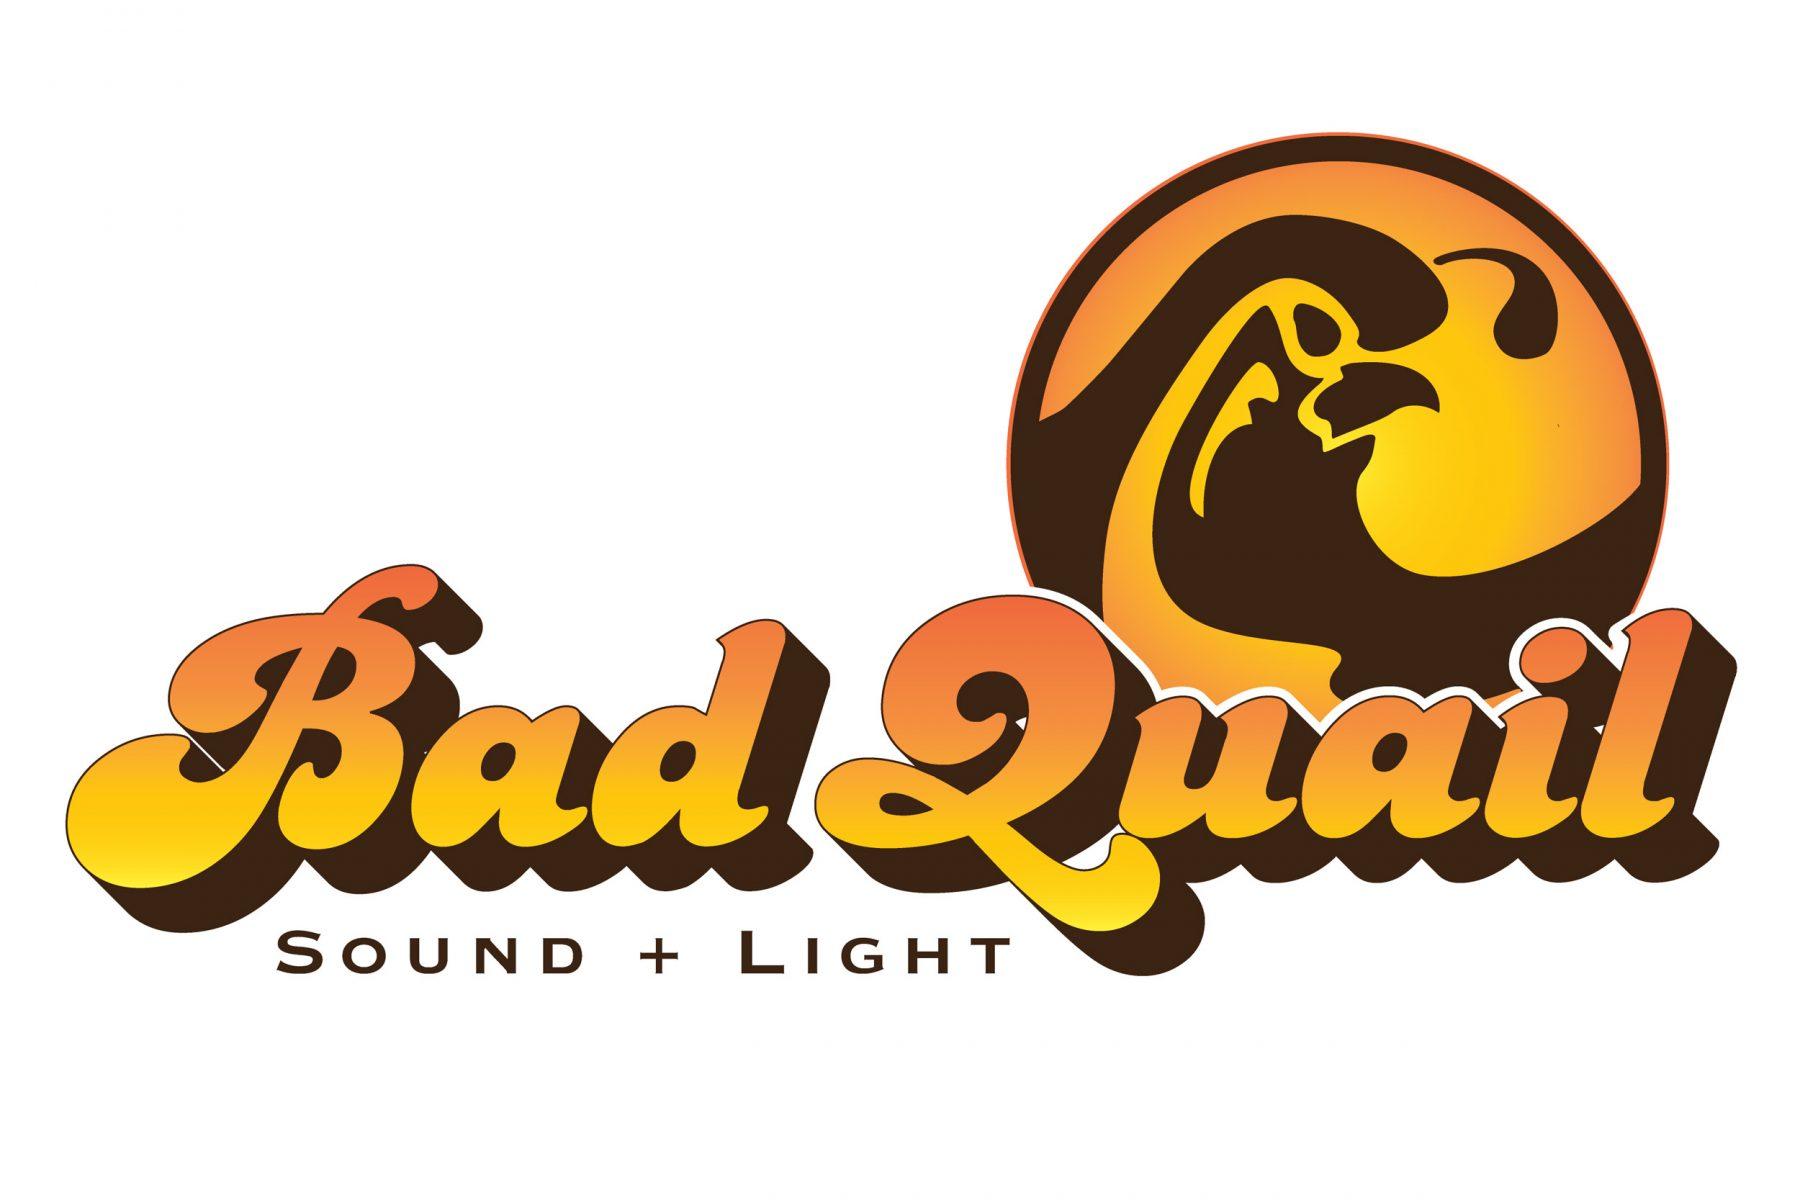 Bad Quail Sound + Light